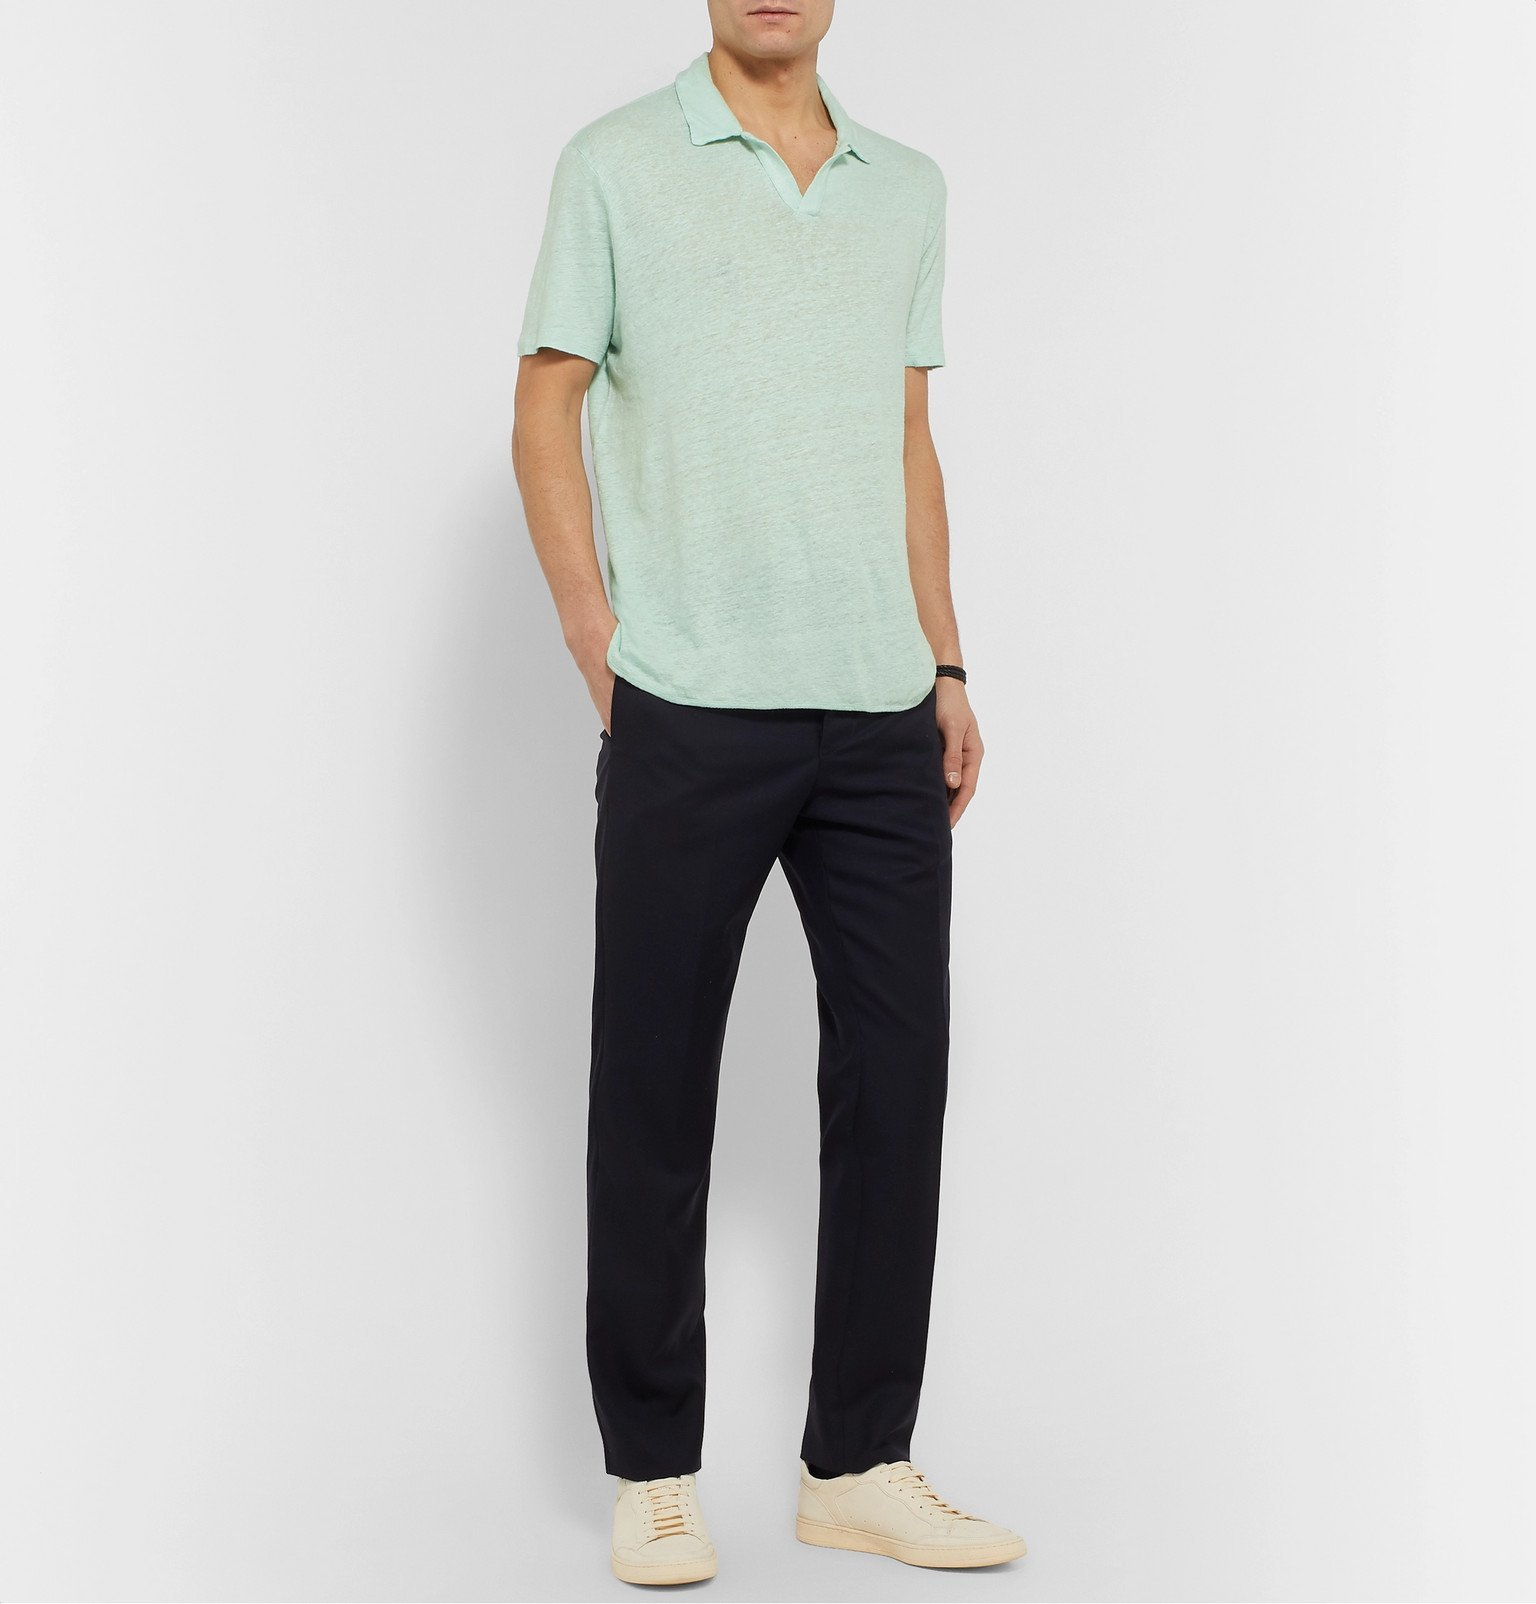 Officine Generale - Simon Slim-Fit Garment-Dyed Linen Polo Shirt - Green